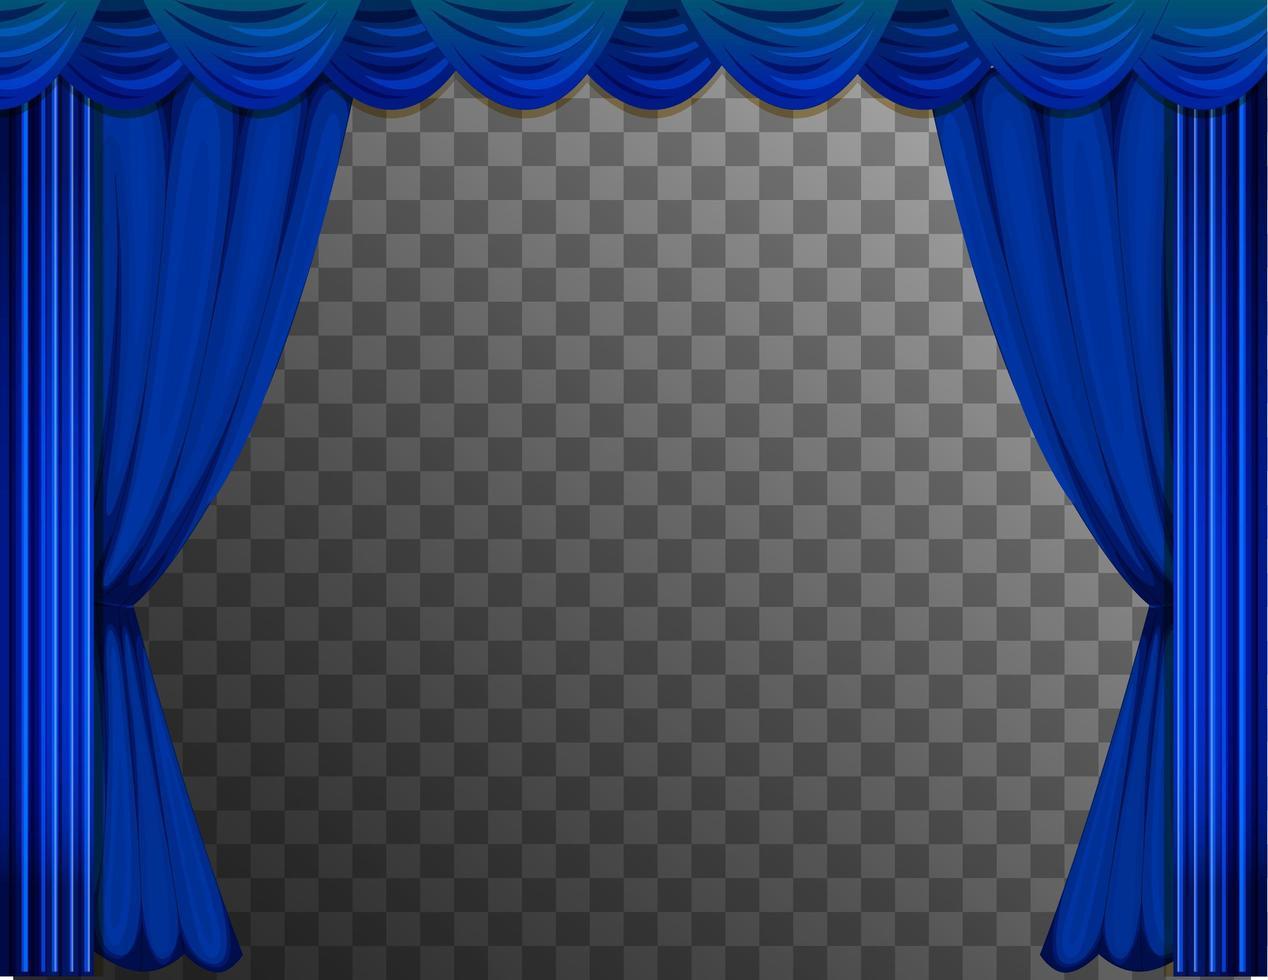 blaue Theatervorhänge vektor